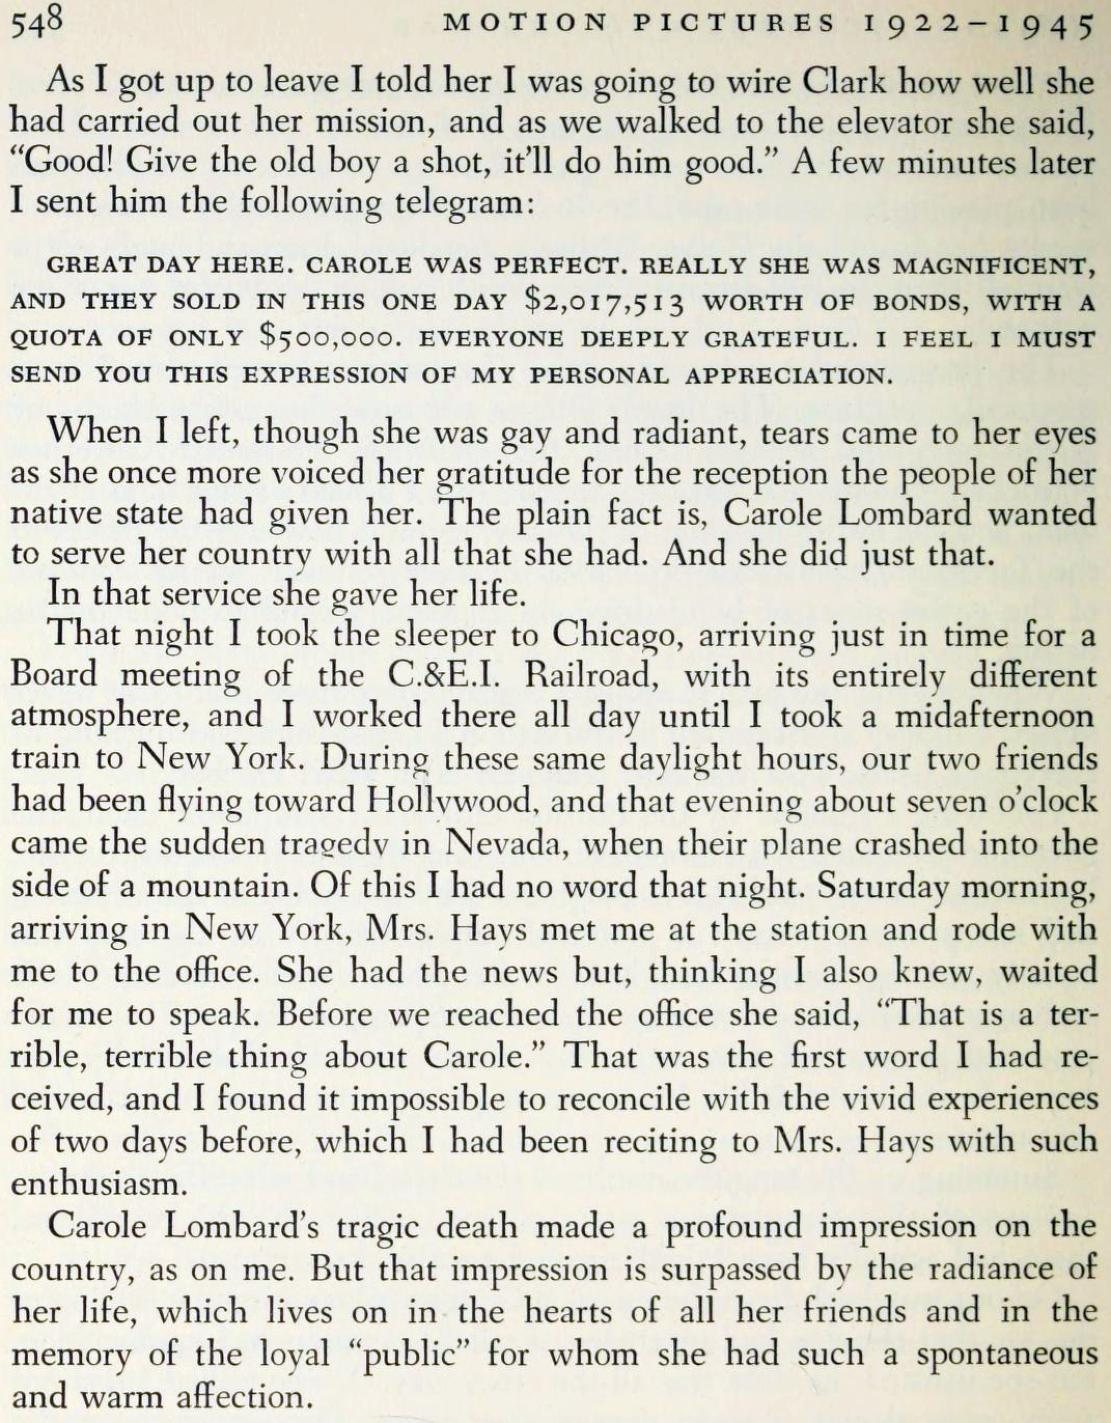 carole lombard memoirs of will b. hays 04a